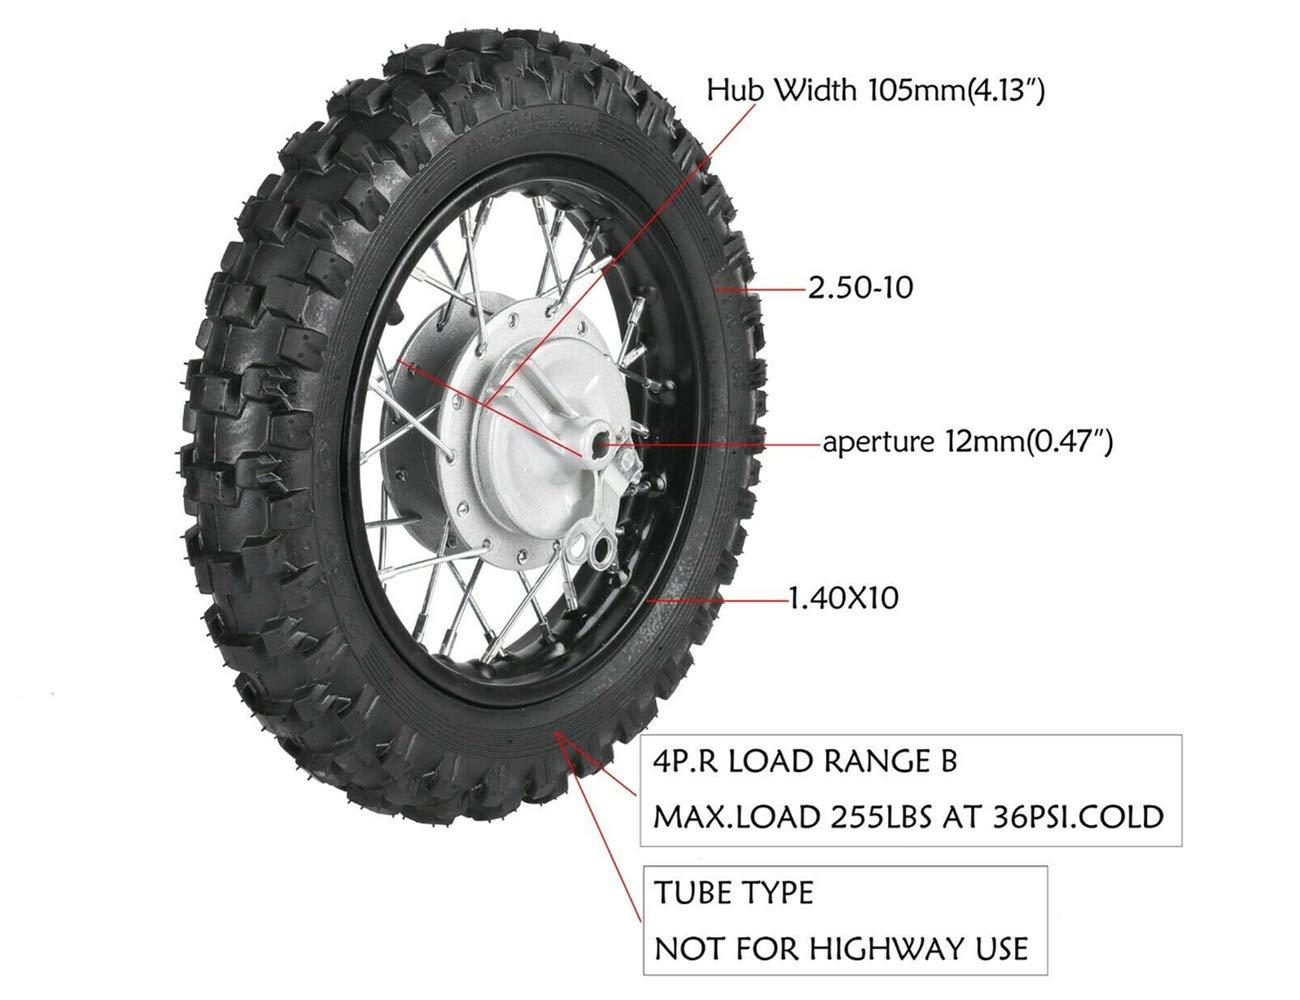 125cc Dirt Bike 12mm 1.4x10 Rear Rim Wheel 2.5-10 Tire 2.50-10 for Pitpro 50cc